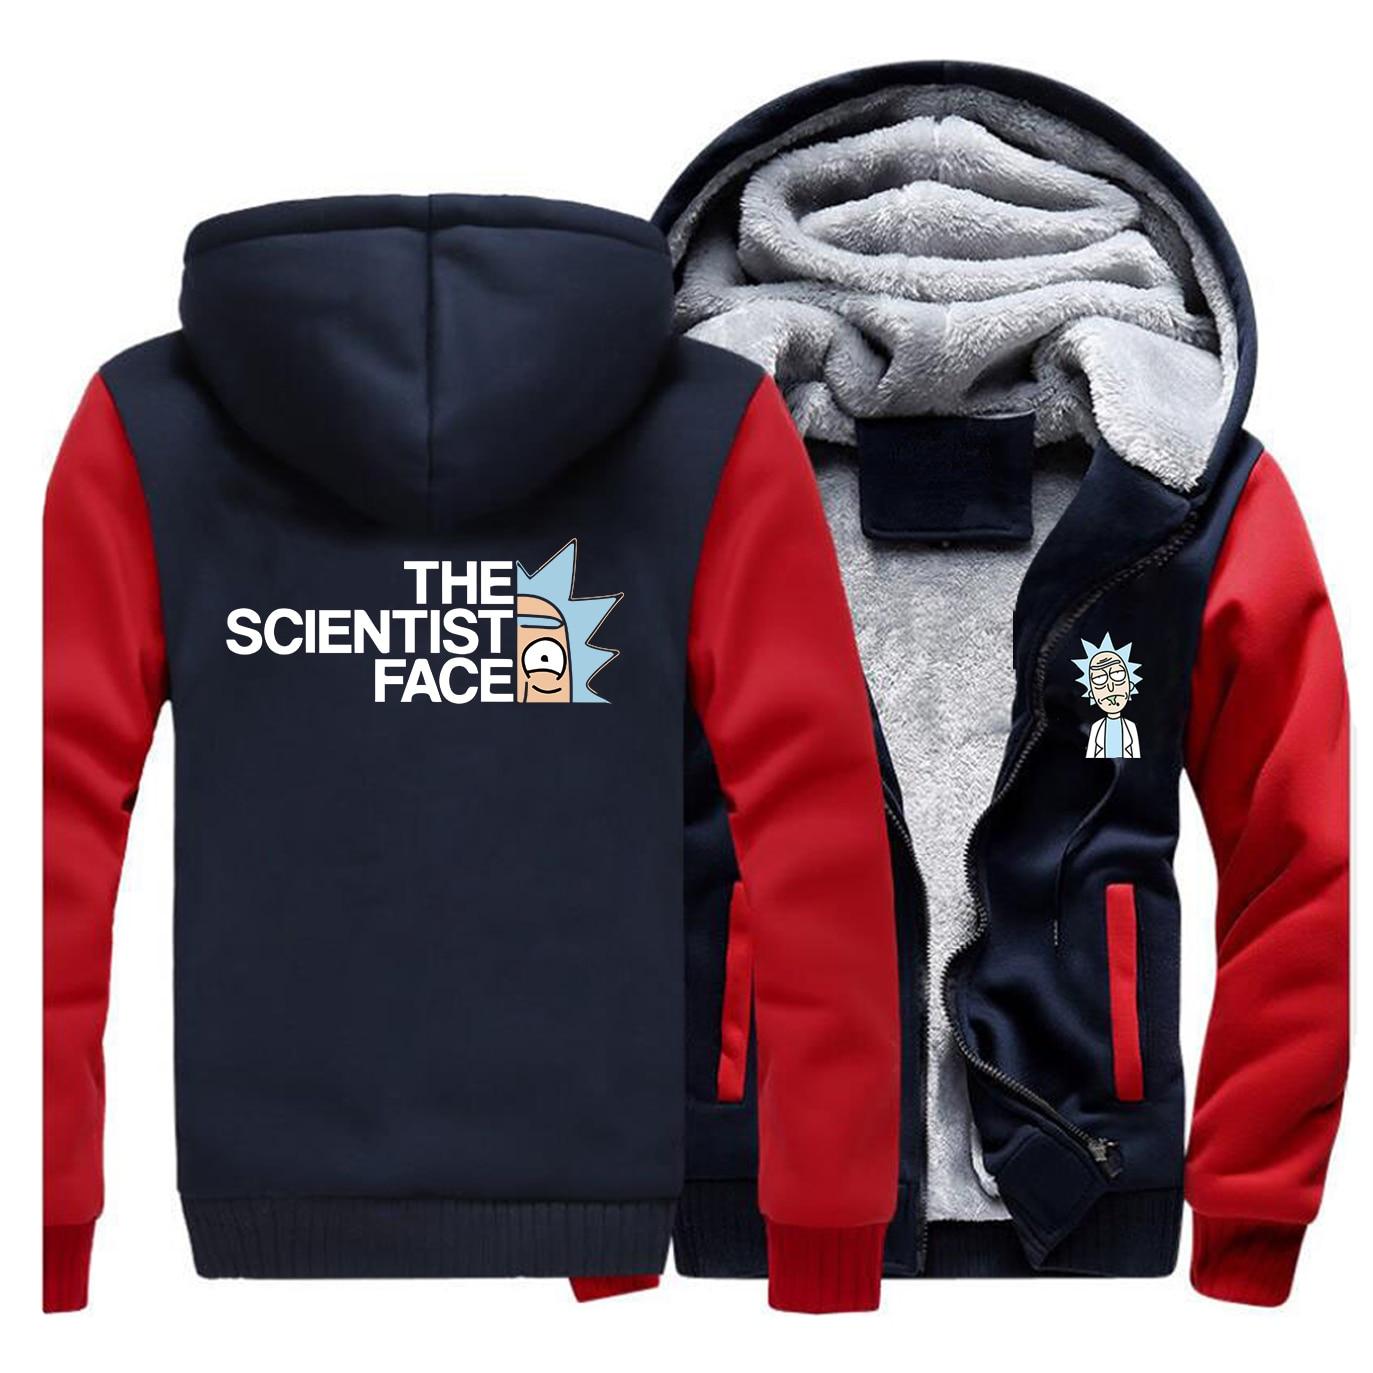 Winter Men Thick Warm Fleece Jacket Rick And Morty Anime The Scientist Face Coat Sweatshirt Raglan Hoodies Jackets Outwear Coats